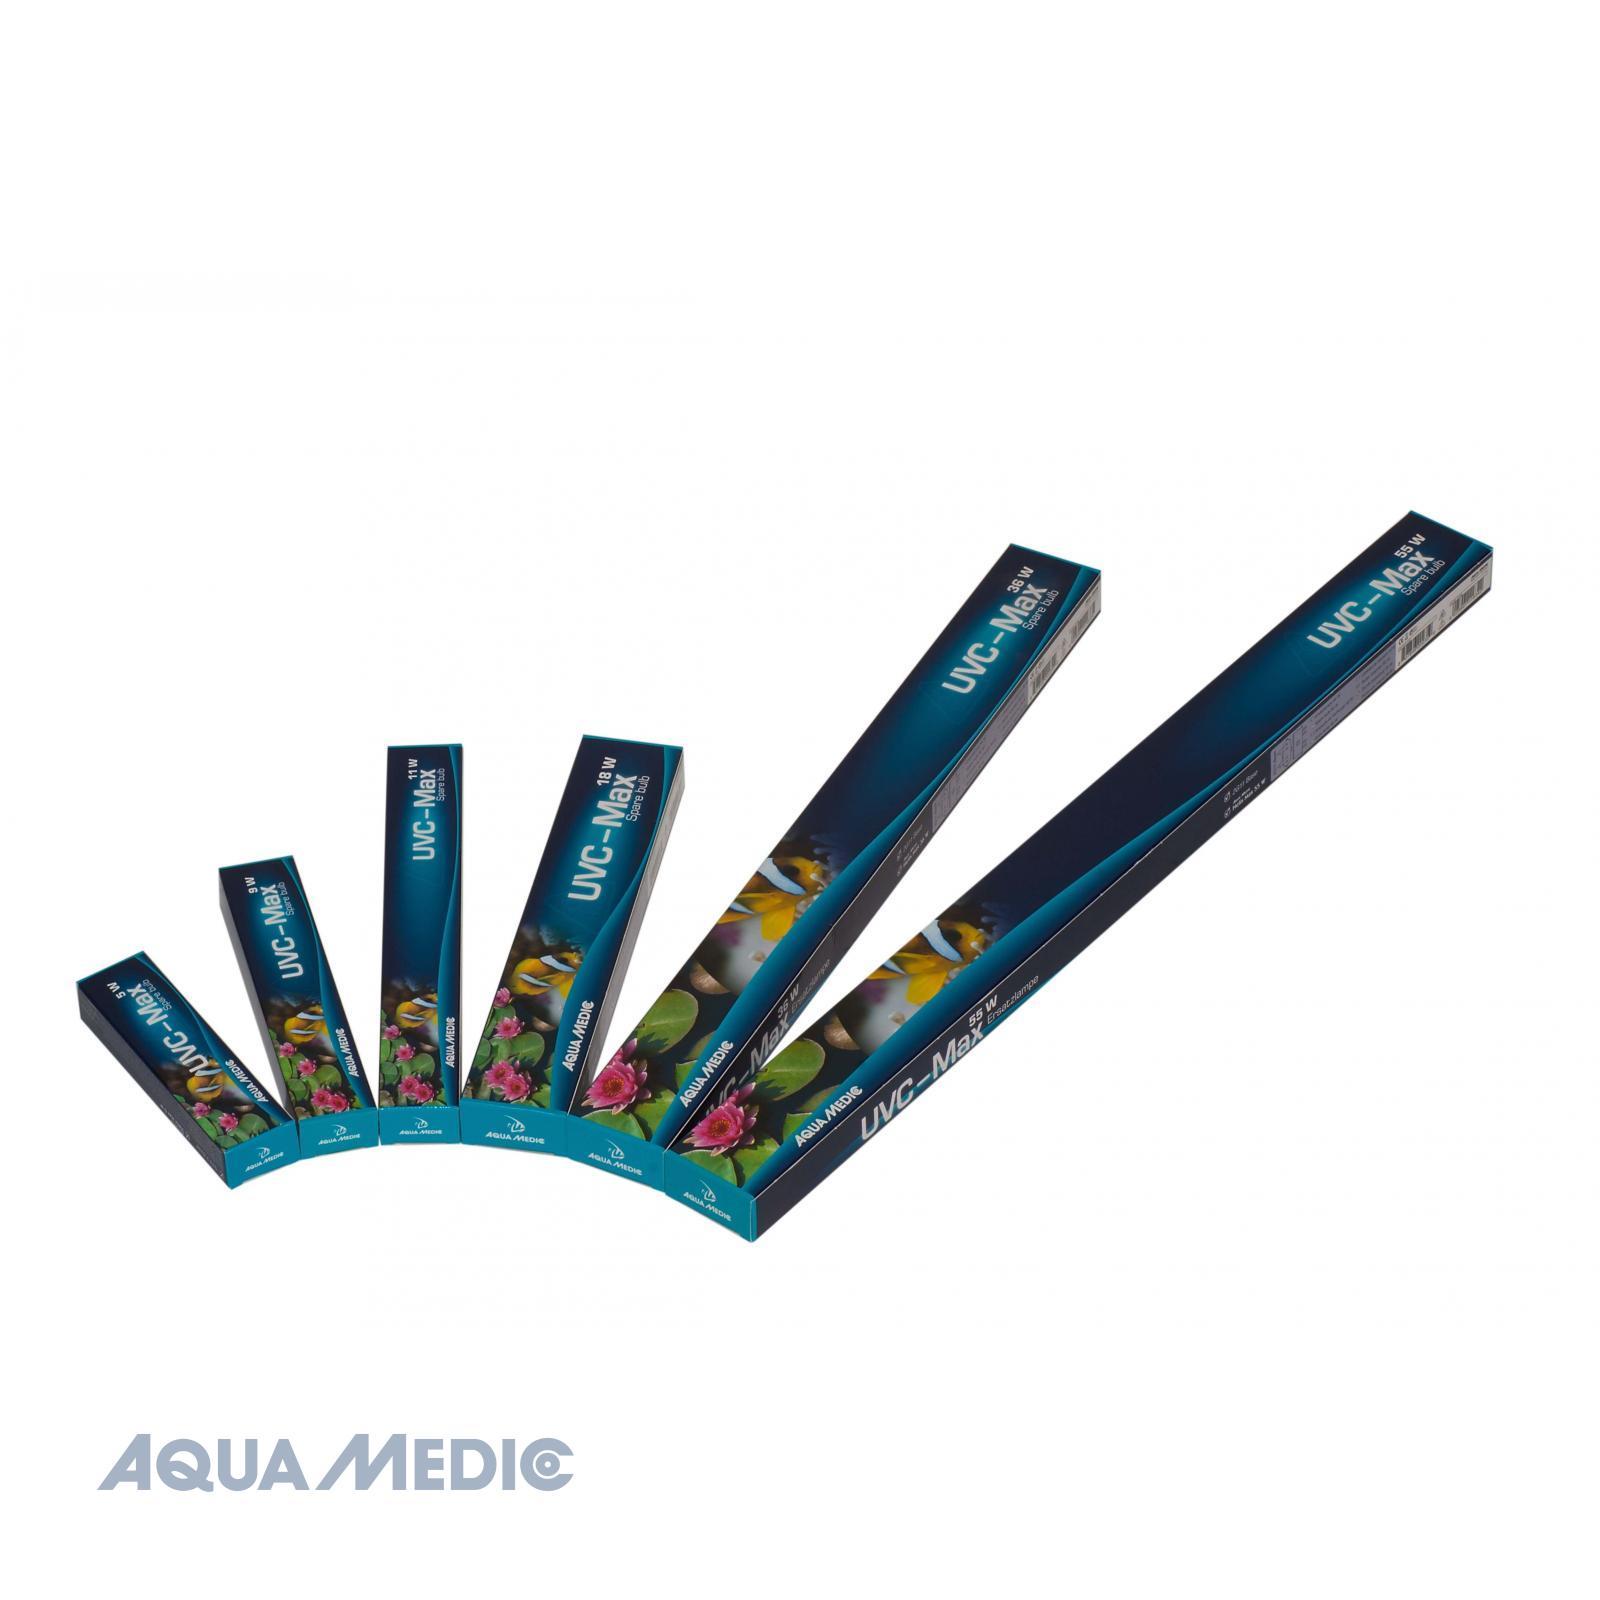 Aquamedic 5w Helx Max Spare Bulb